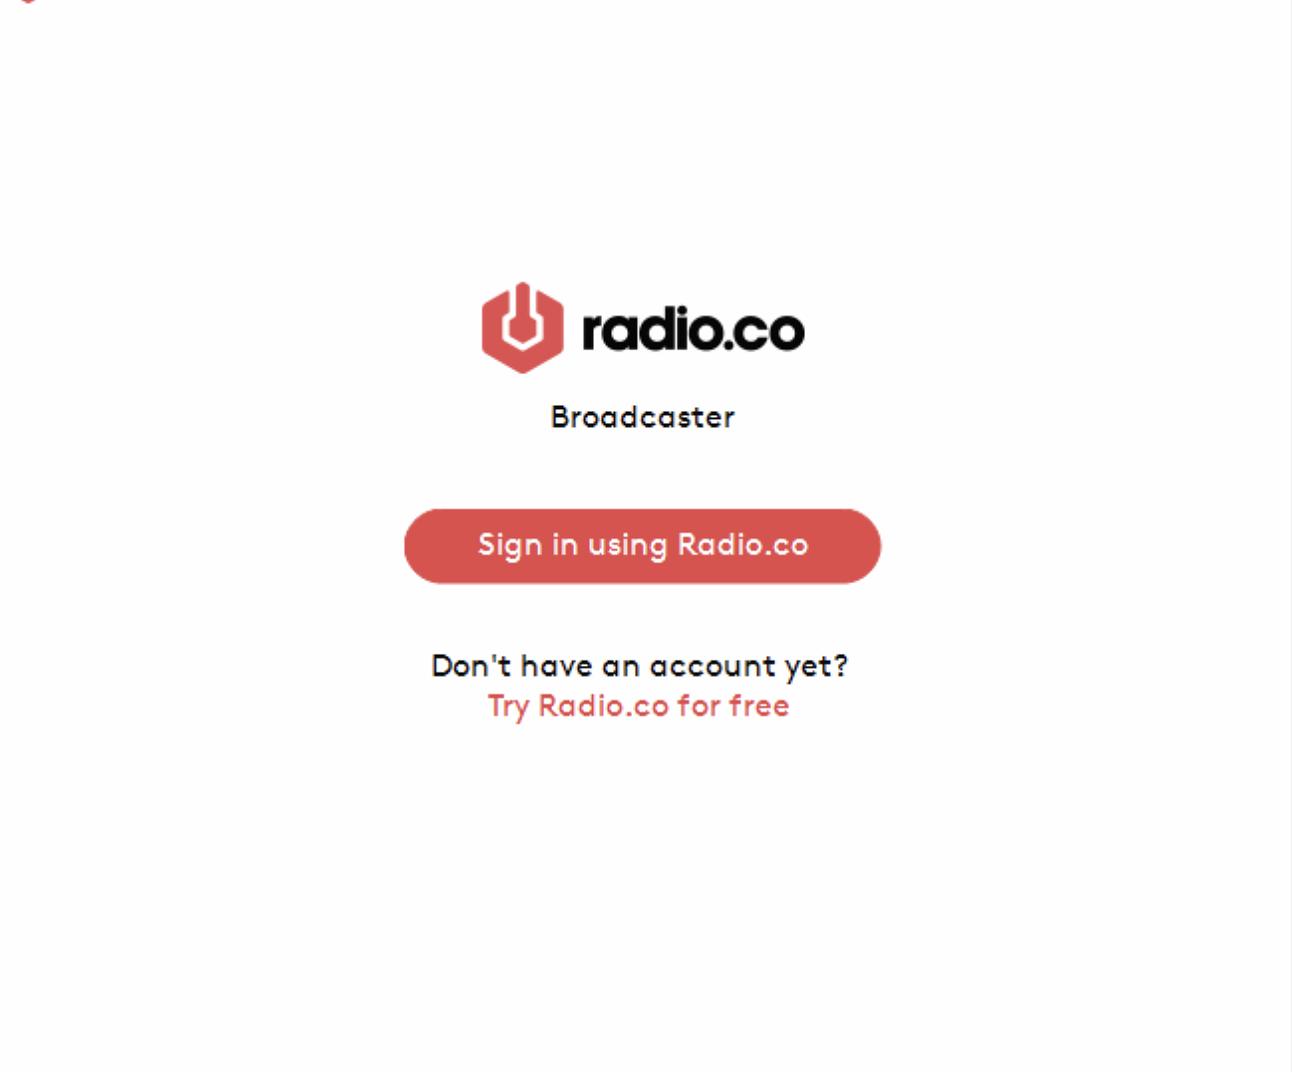 Radio.co Broadcaster login screen.